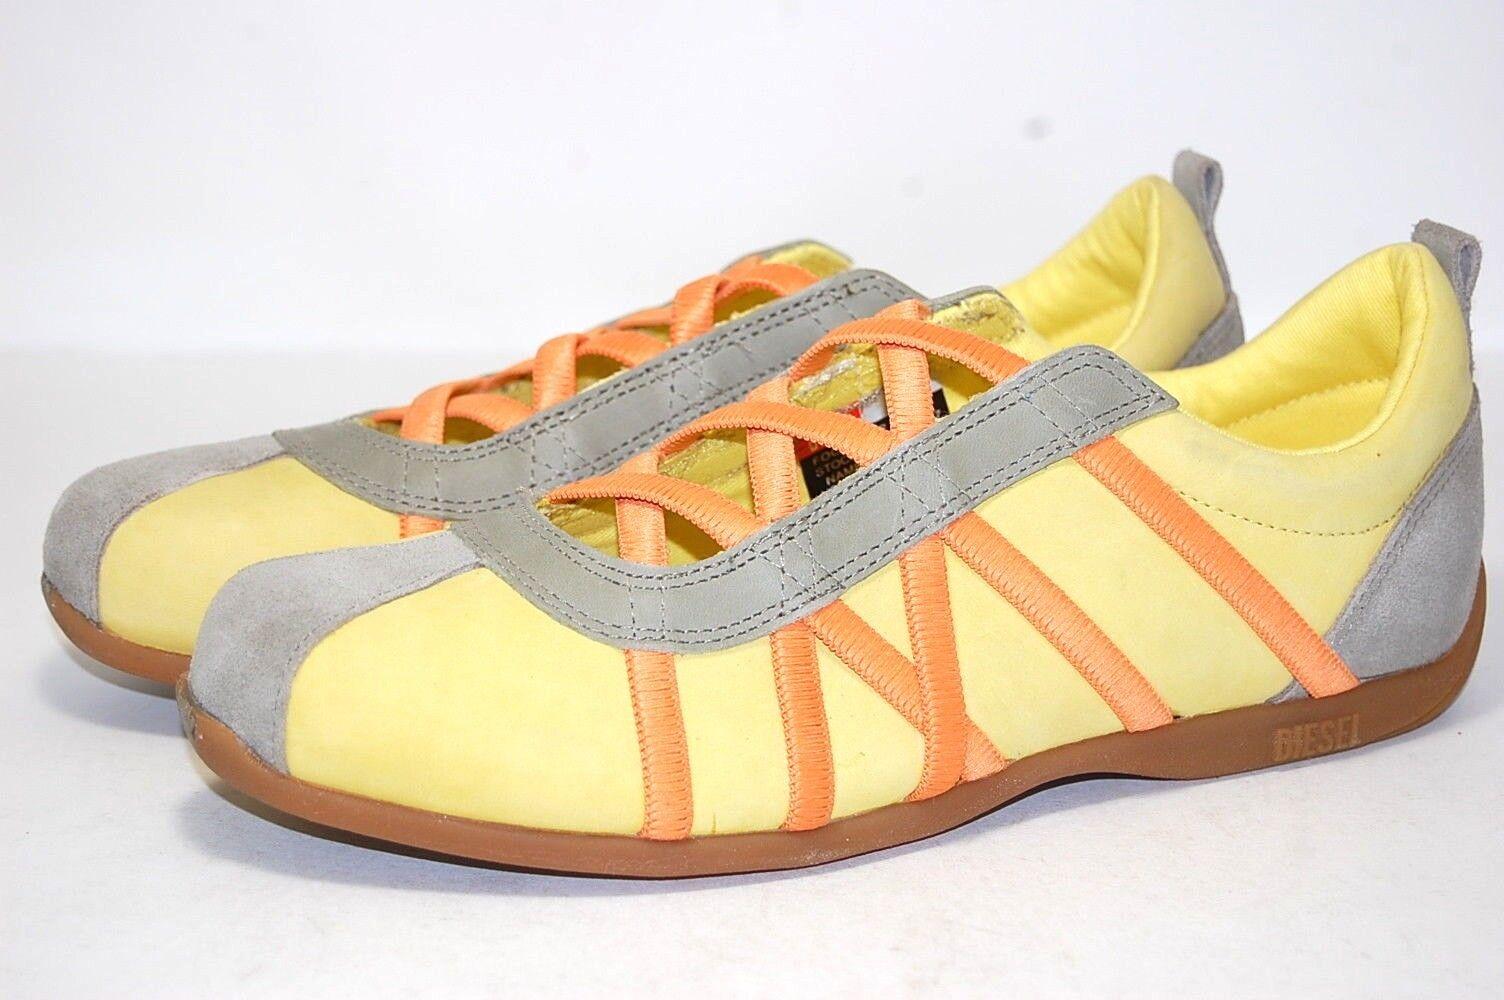 Diesel Valencia Pina/Plank 102100005067 Leder Casual Damens Schuhes